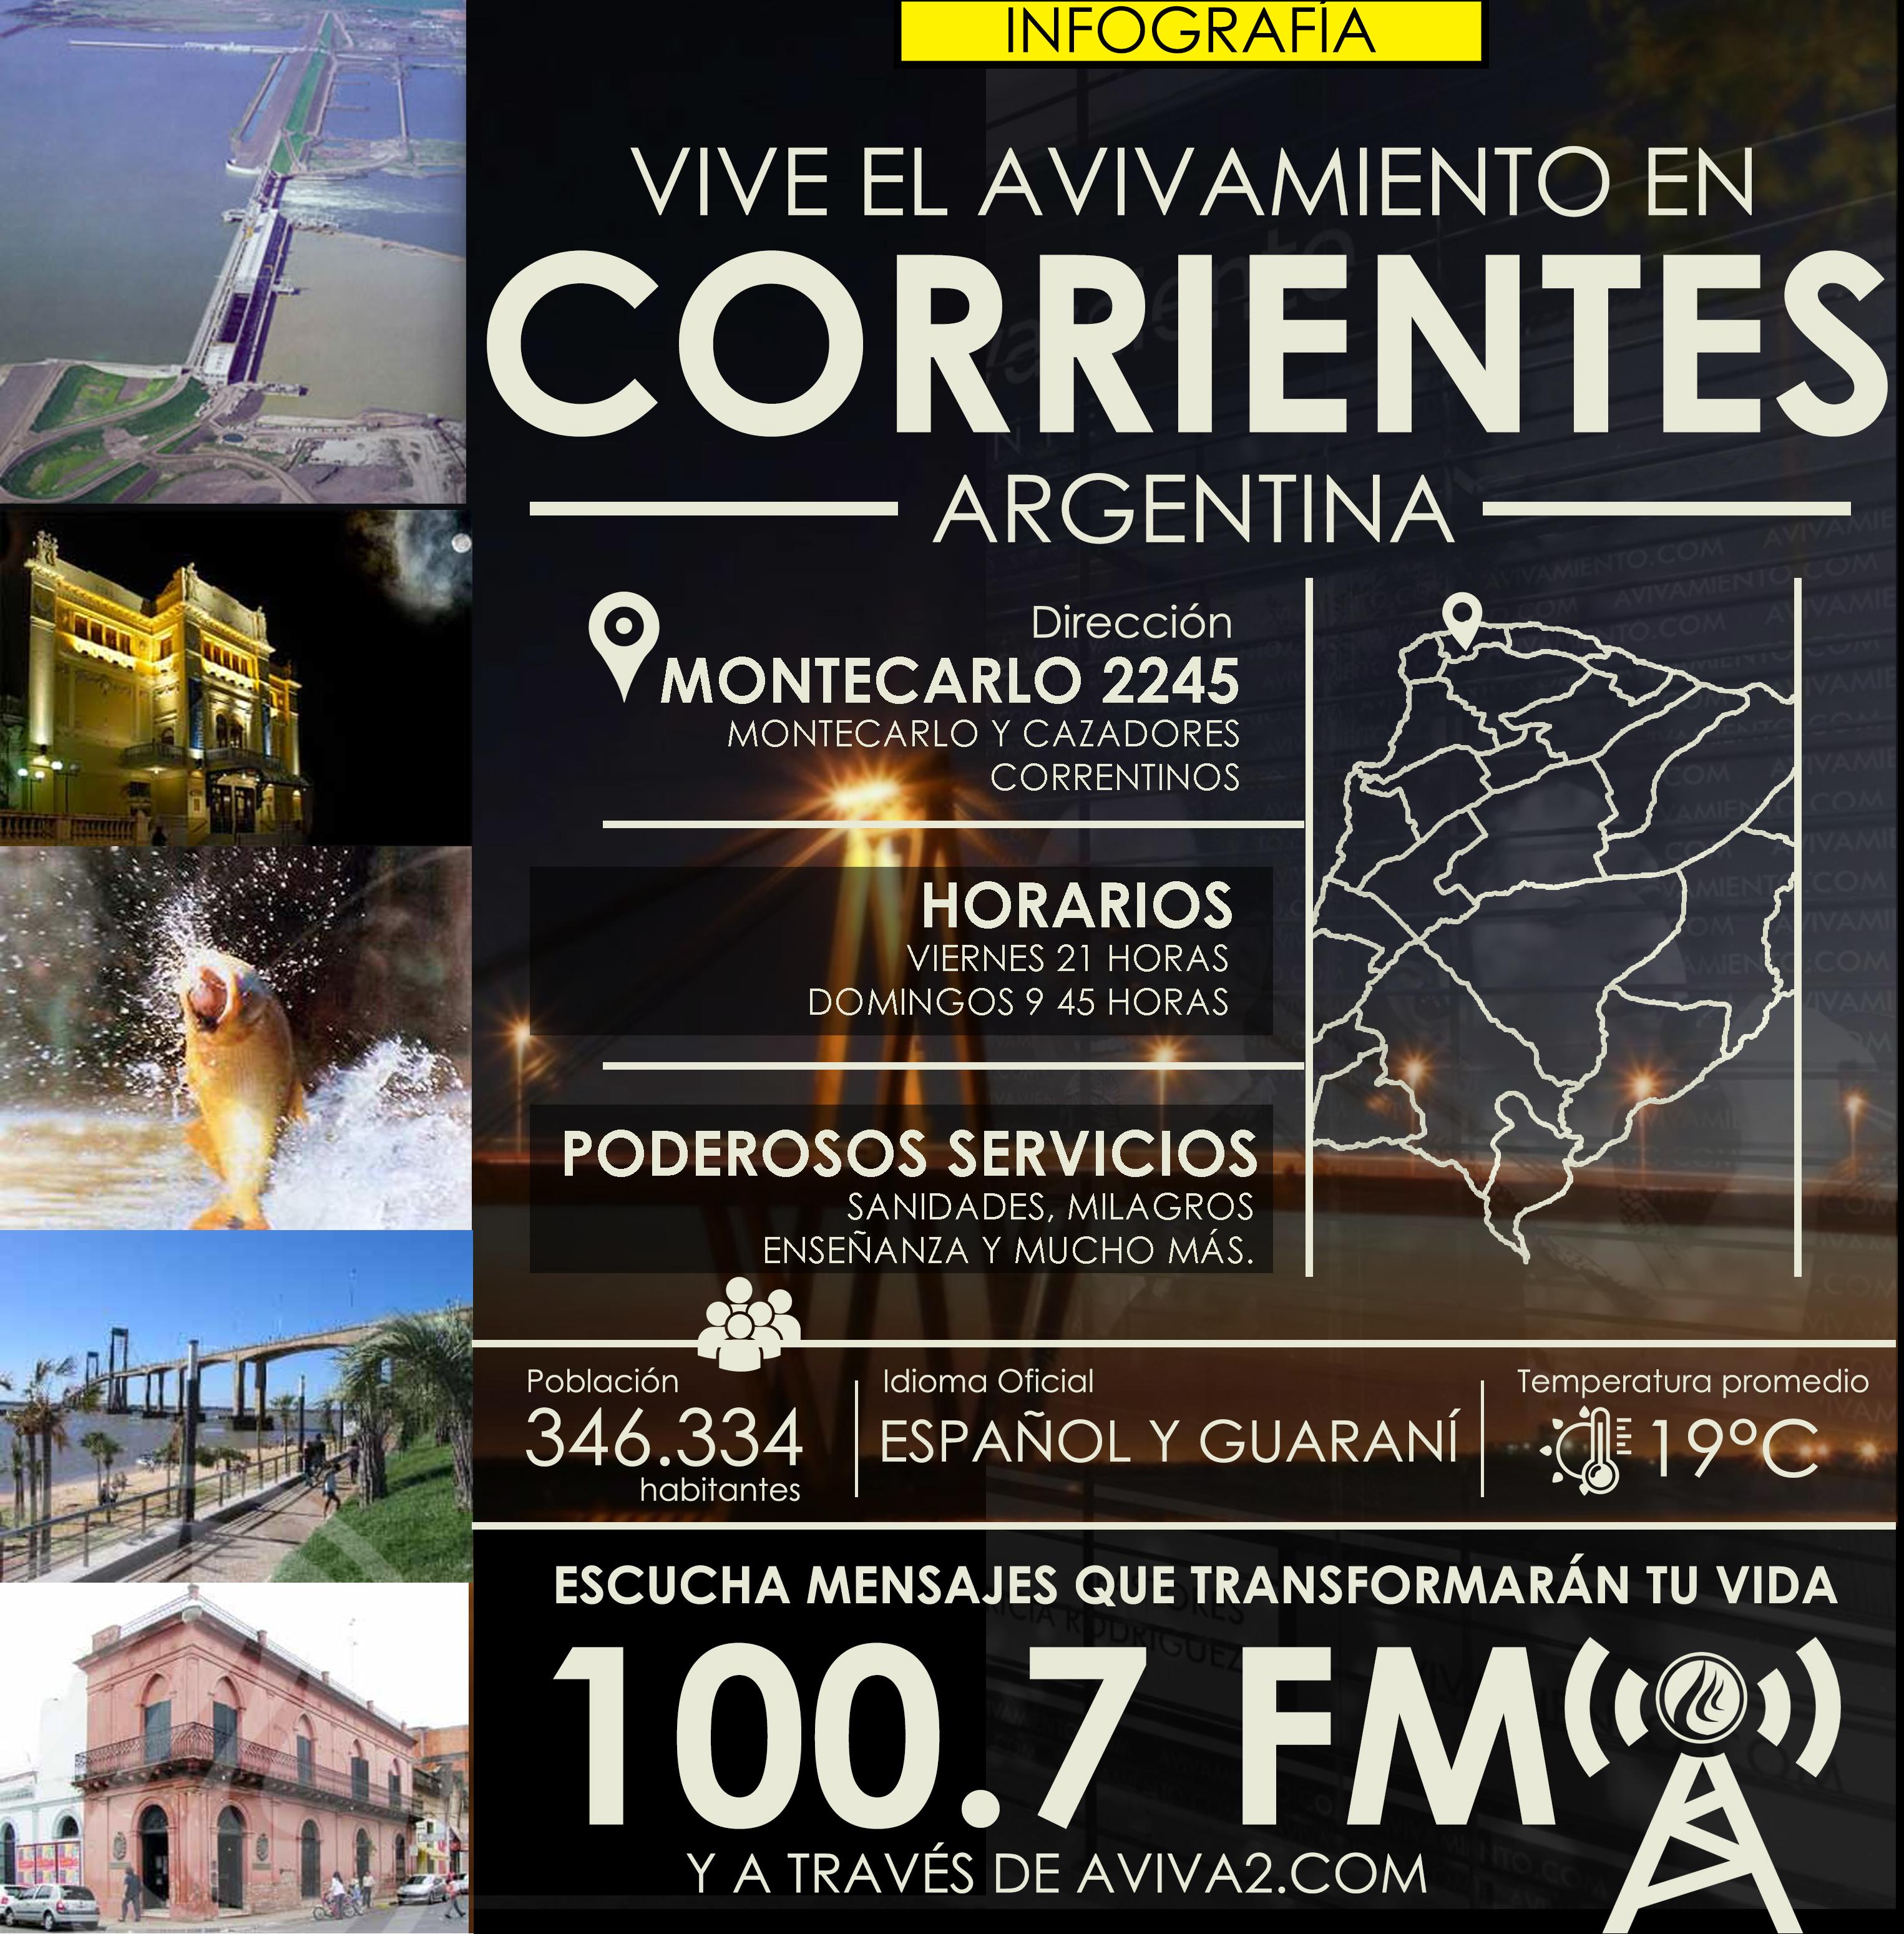 Aviva2 llega a Corrientes - Argentina en los 100.7 FM